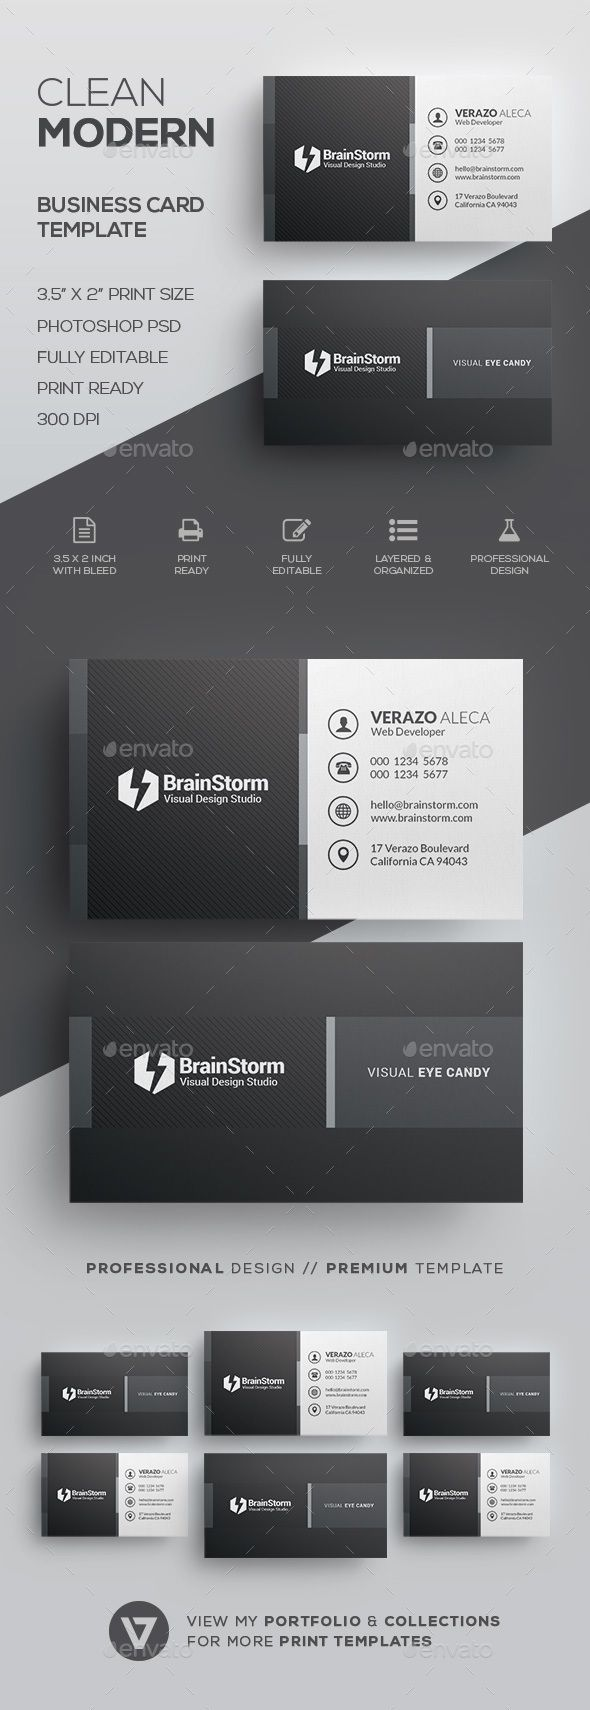 137 best Business cards images on Pinterest | Business card design ...